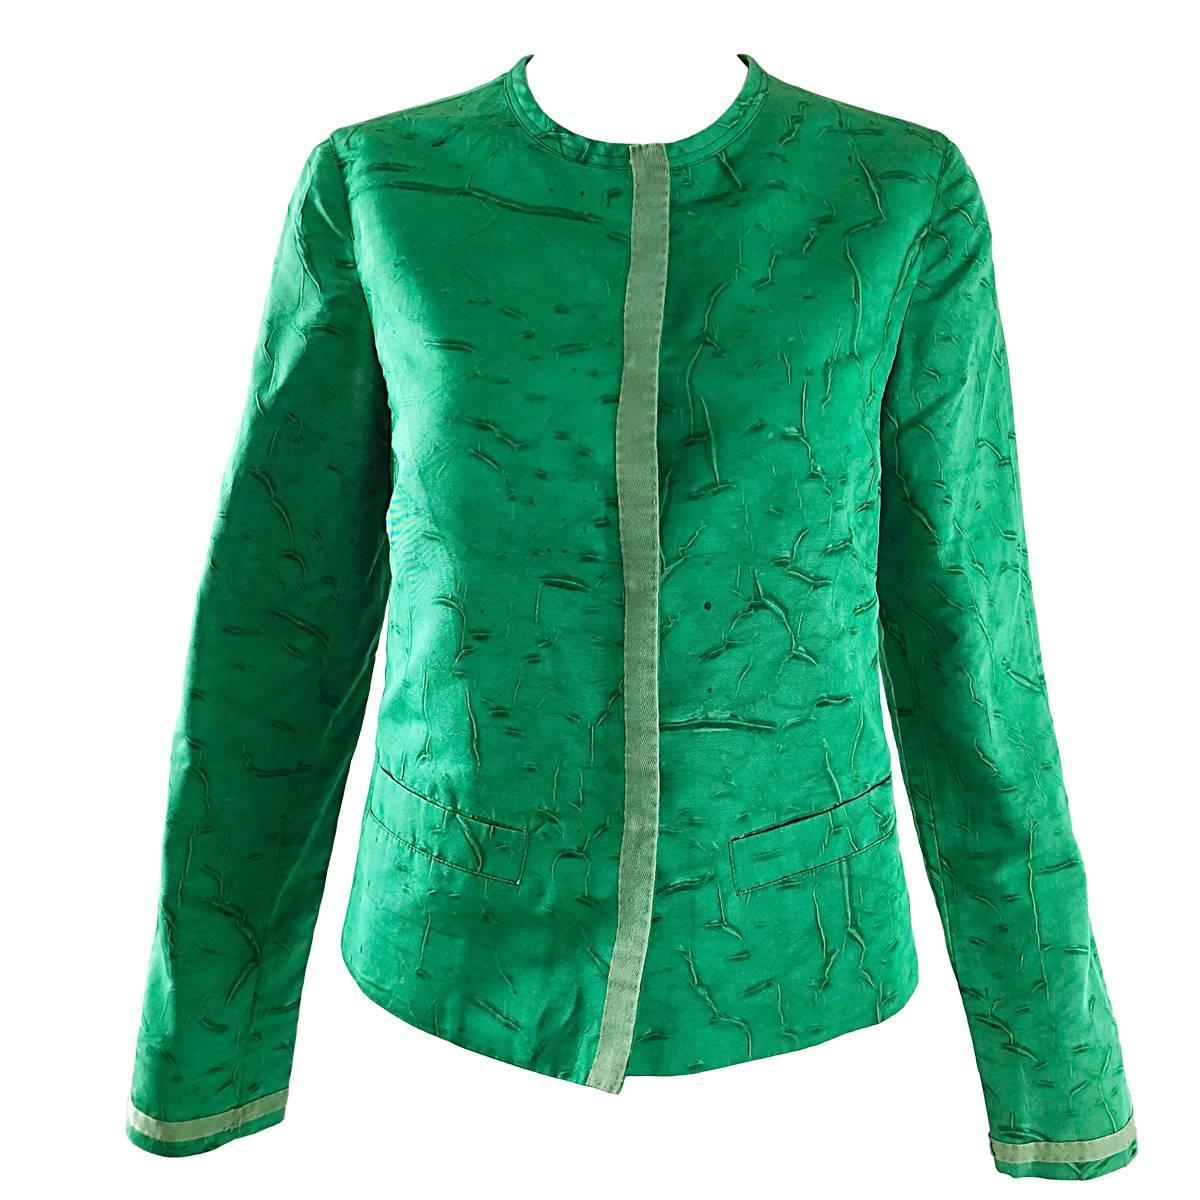 Prada 1990s Kelly Green Tie Dyed Vintage 90s Does 60s Pillbox Jacket w/ Pockets